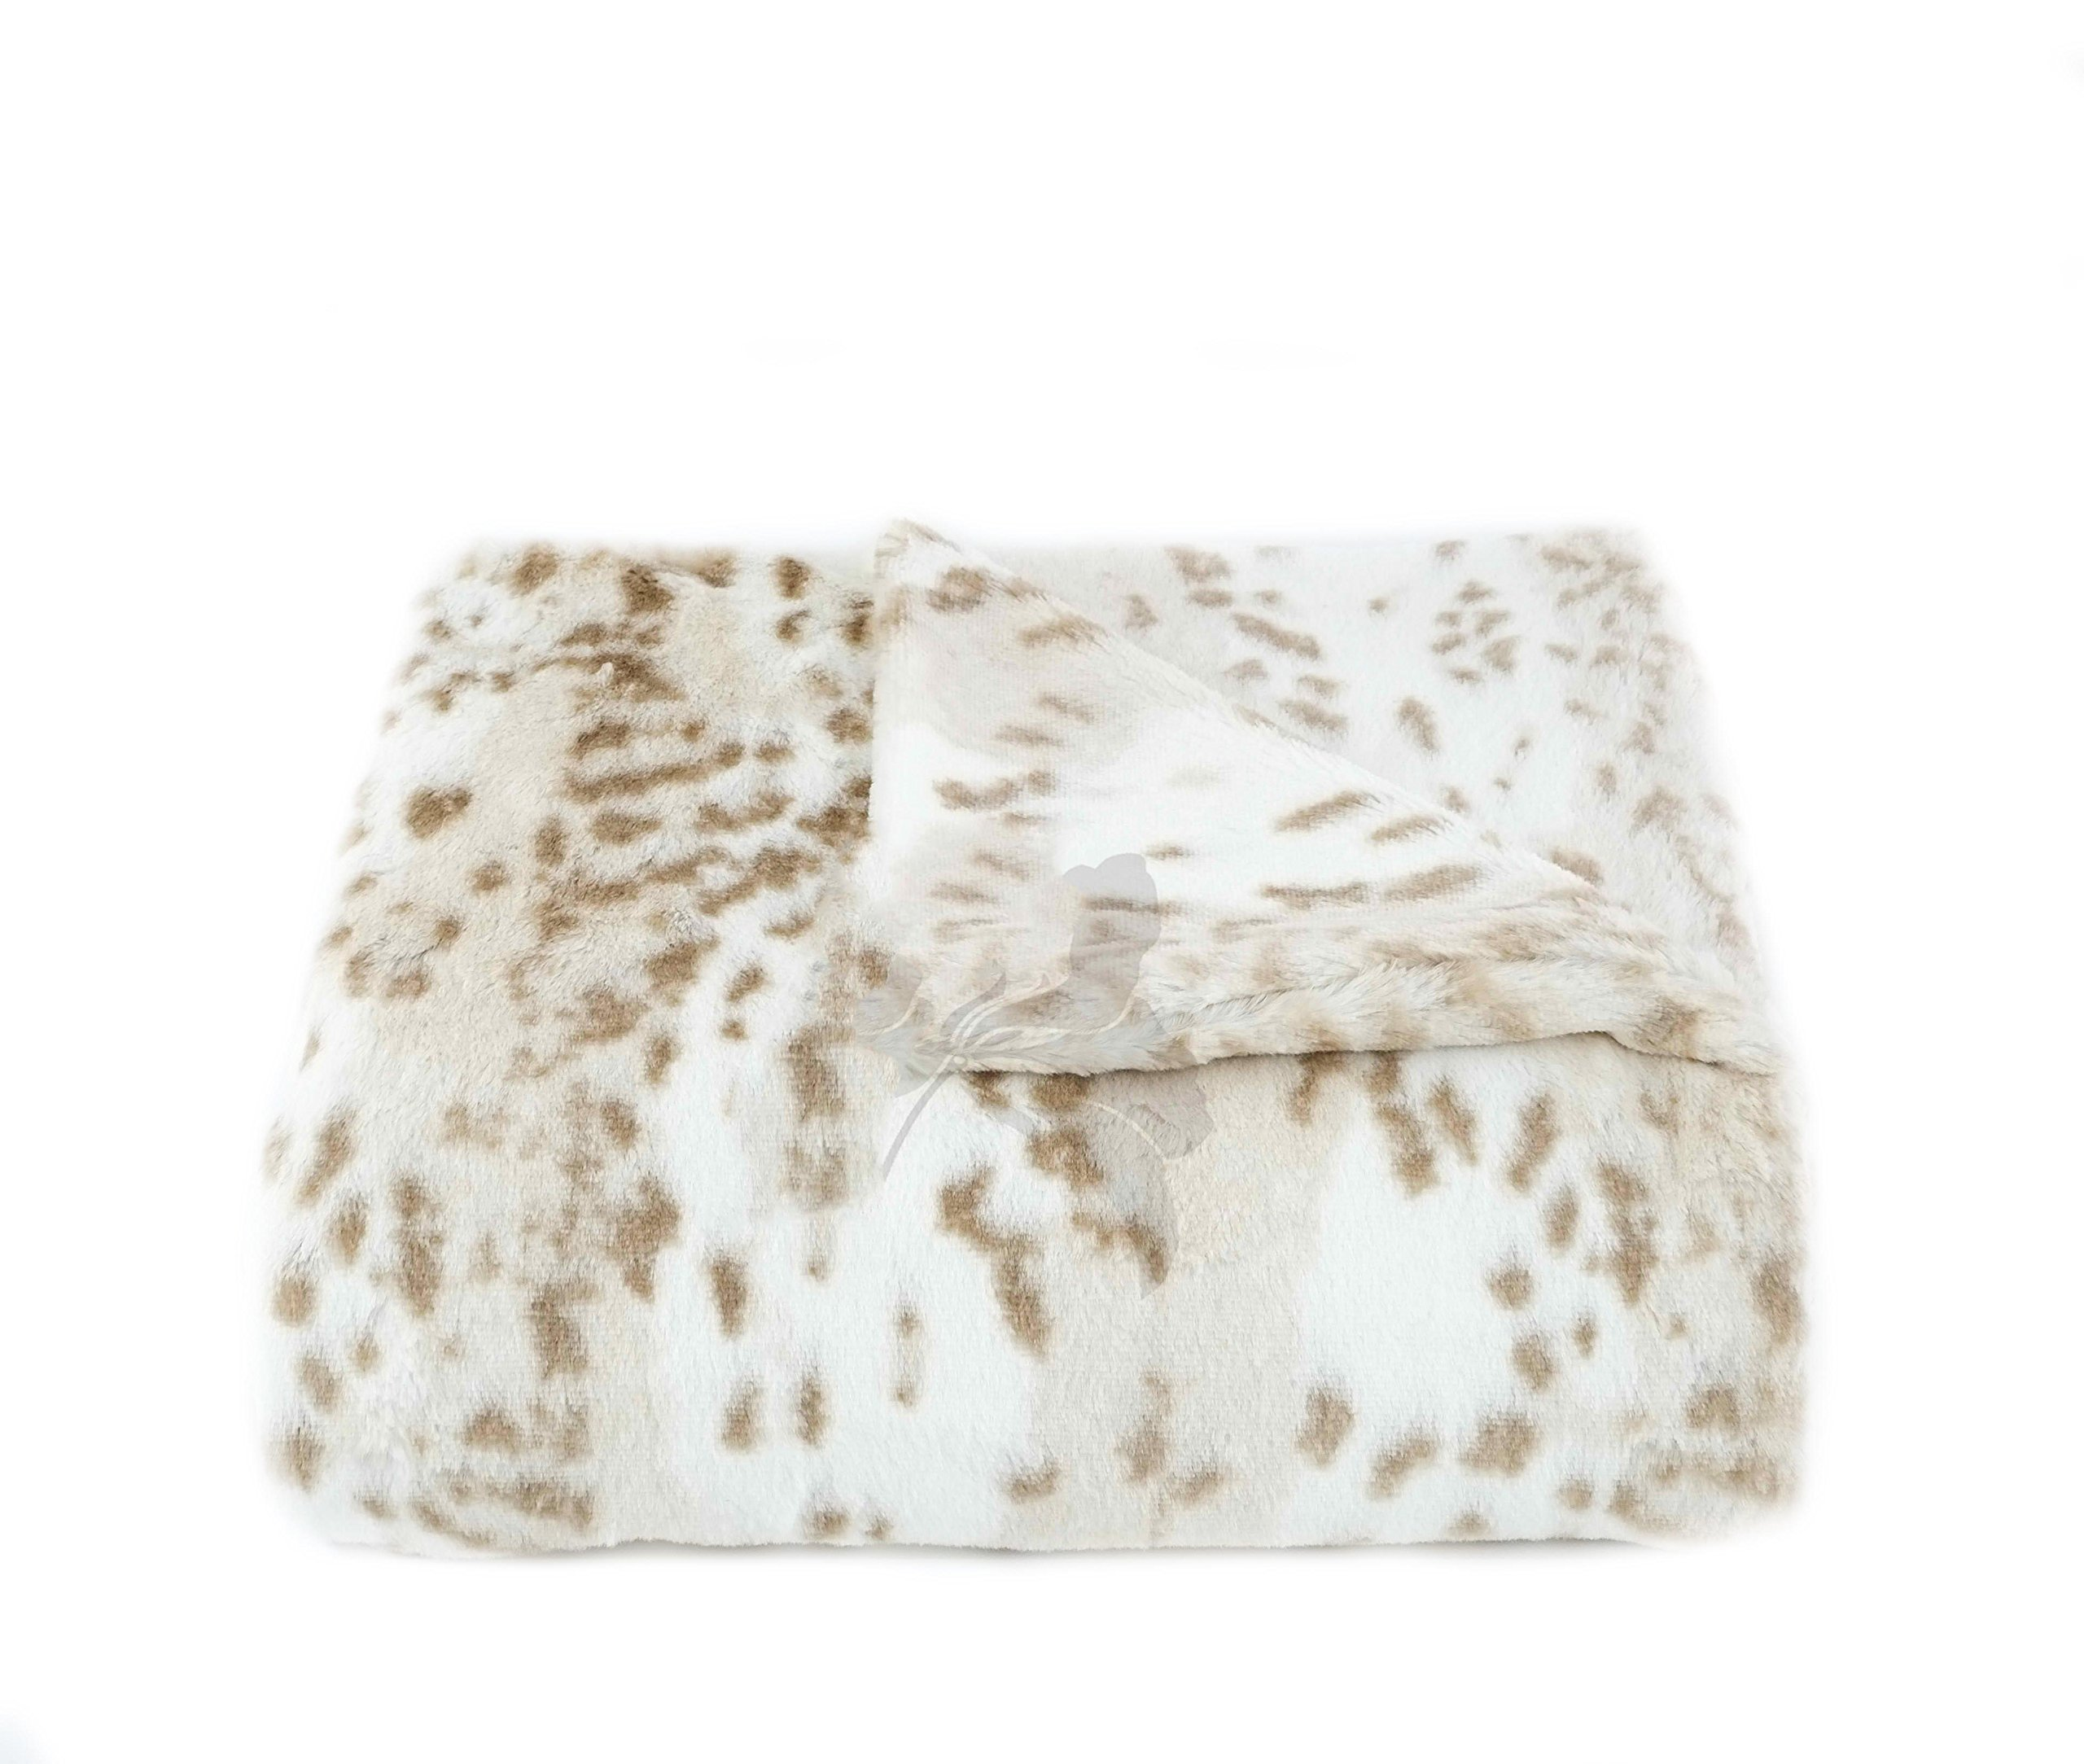 Tourance New Brown Snow Leopard Crib Blanket, 30'' x 30''